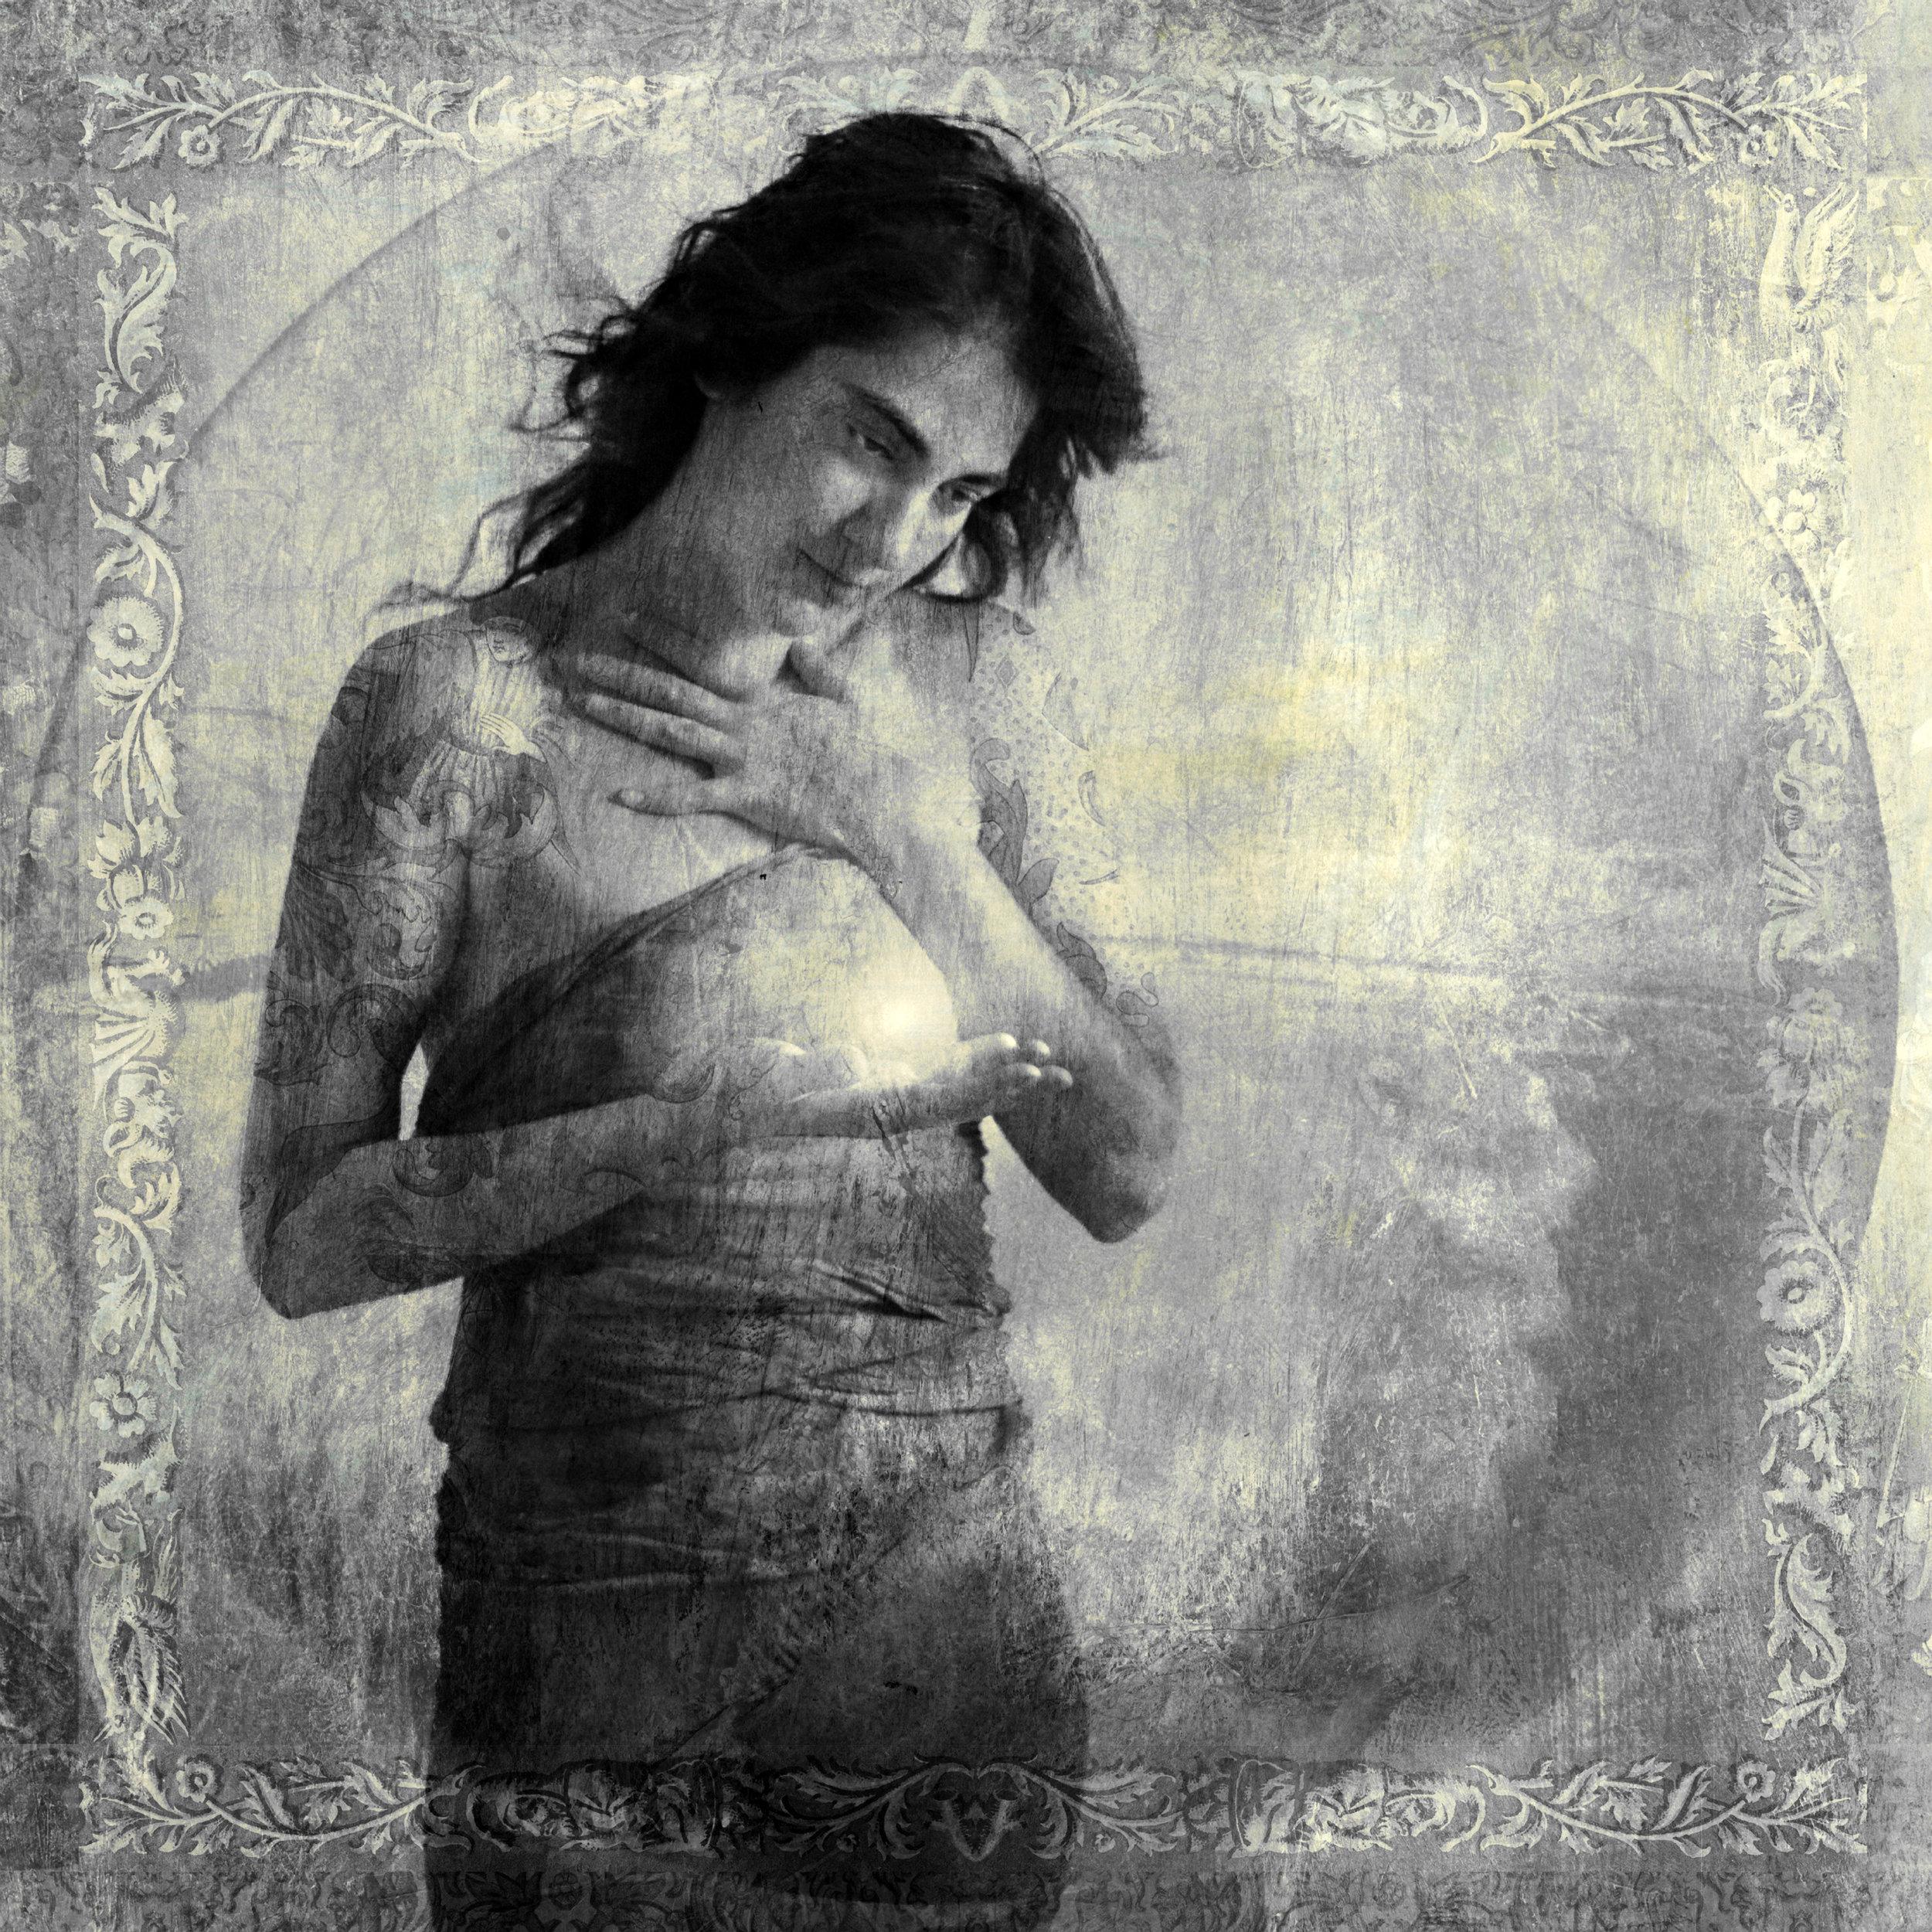 Woman With Light Original.jpg